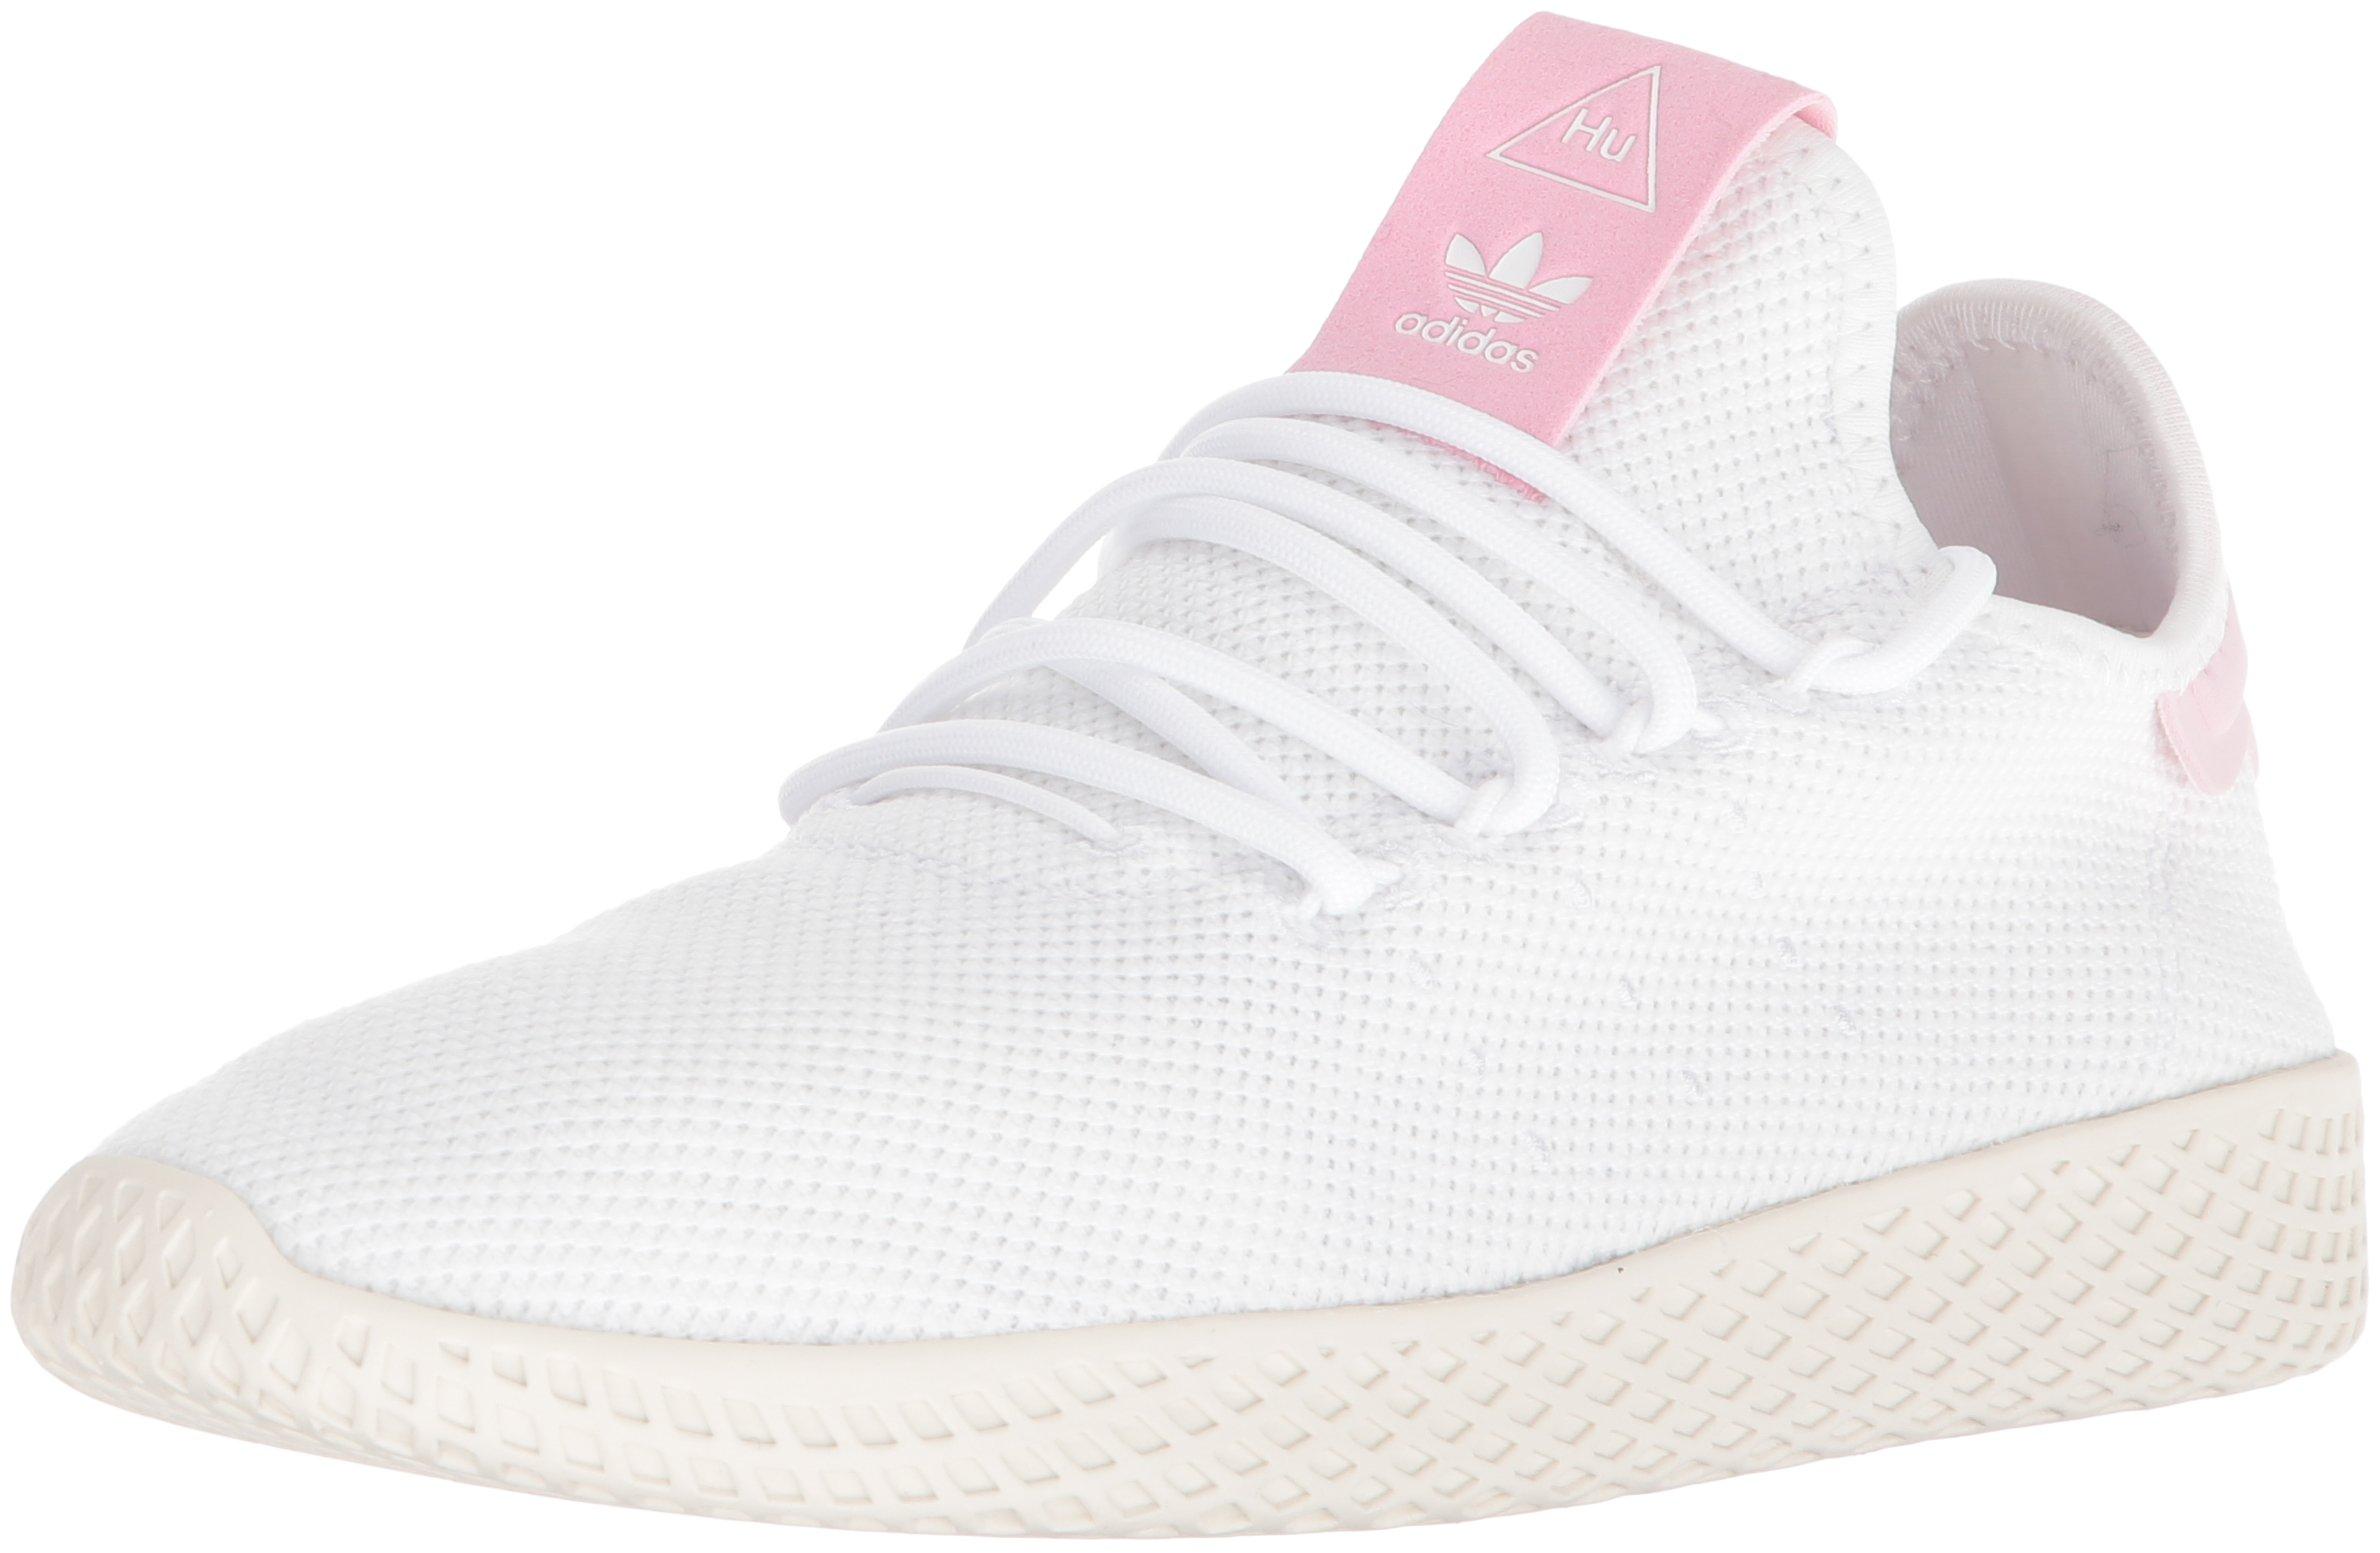 pw tennis shoes